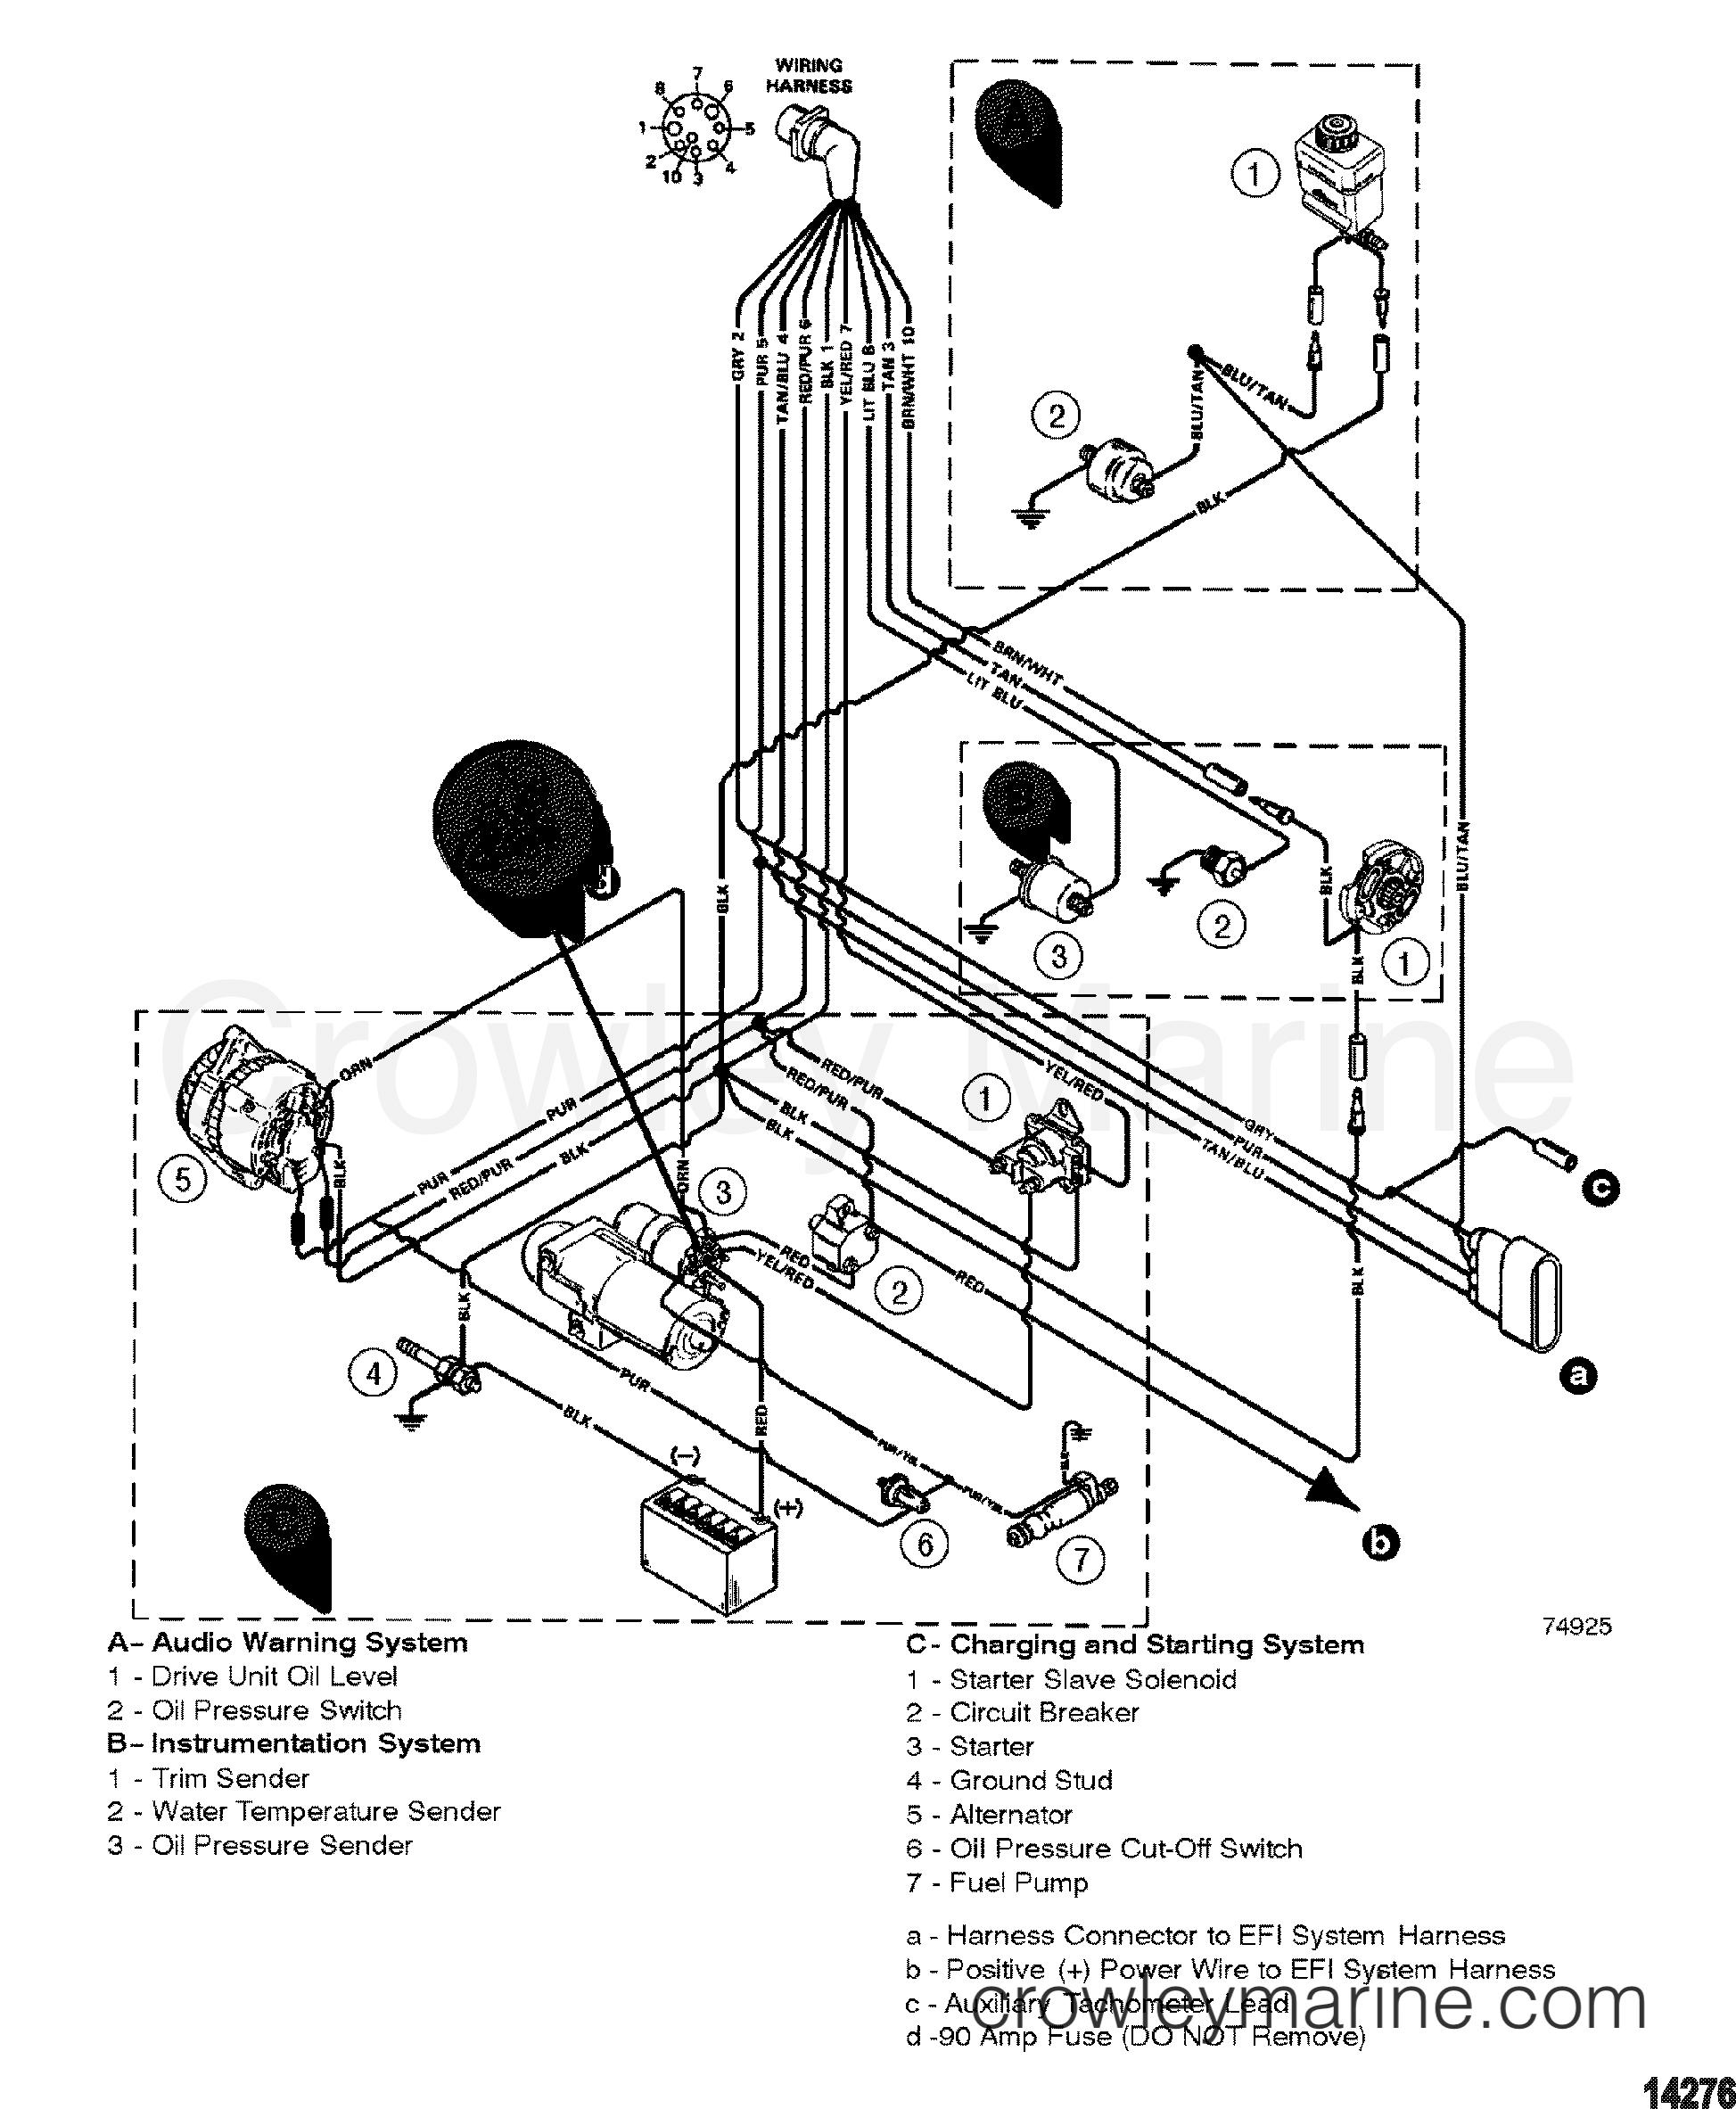 Wiring harness engine 1998 mercruiser 4 3l alpha efi 4231017l1 wiring harness